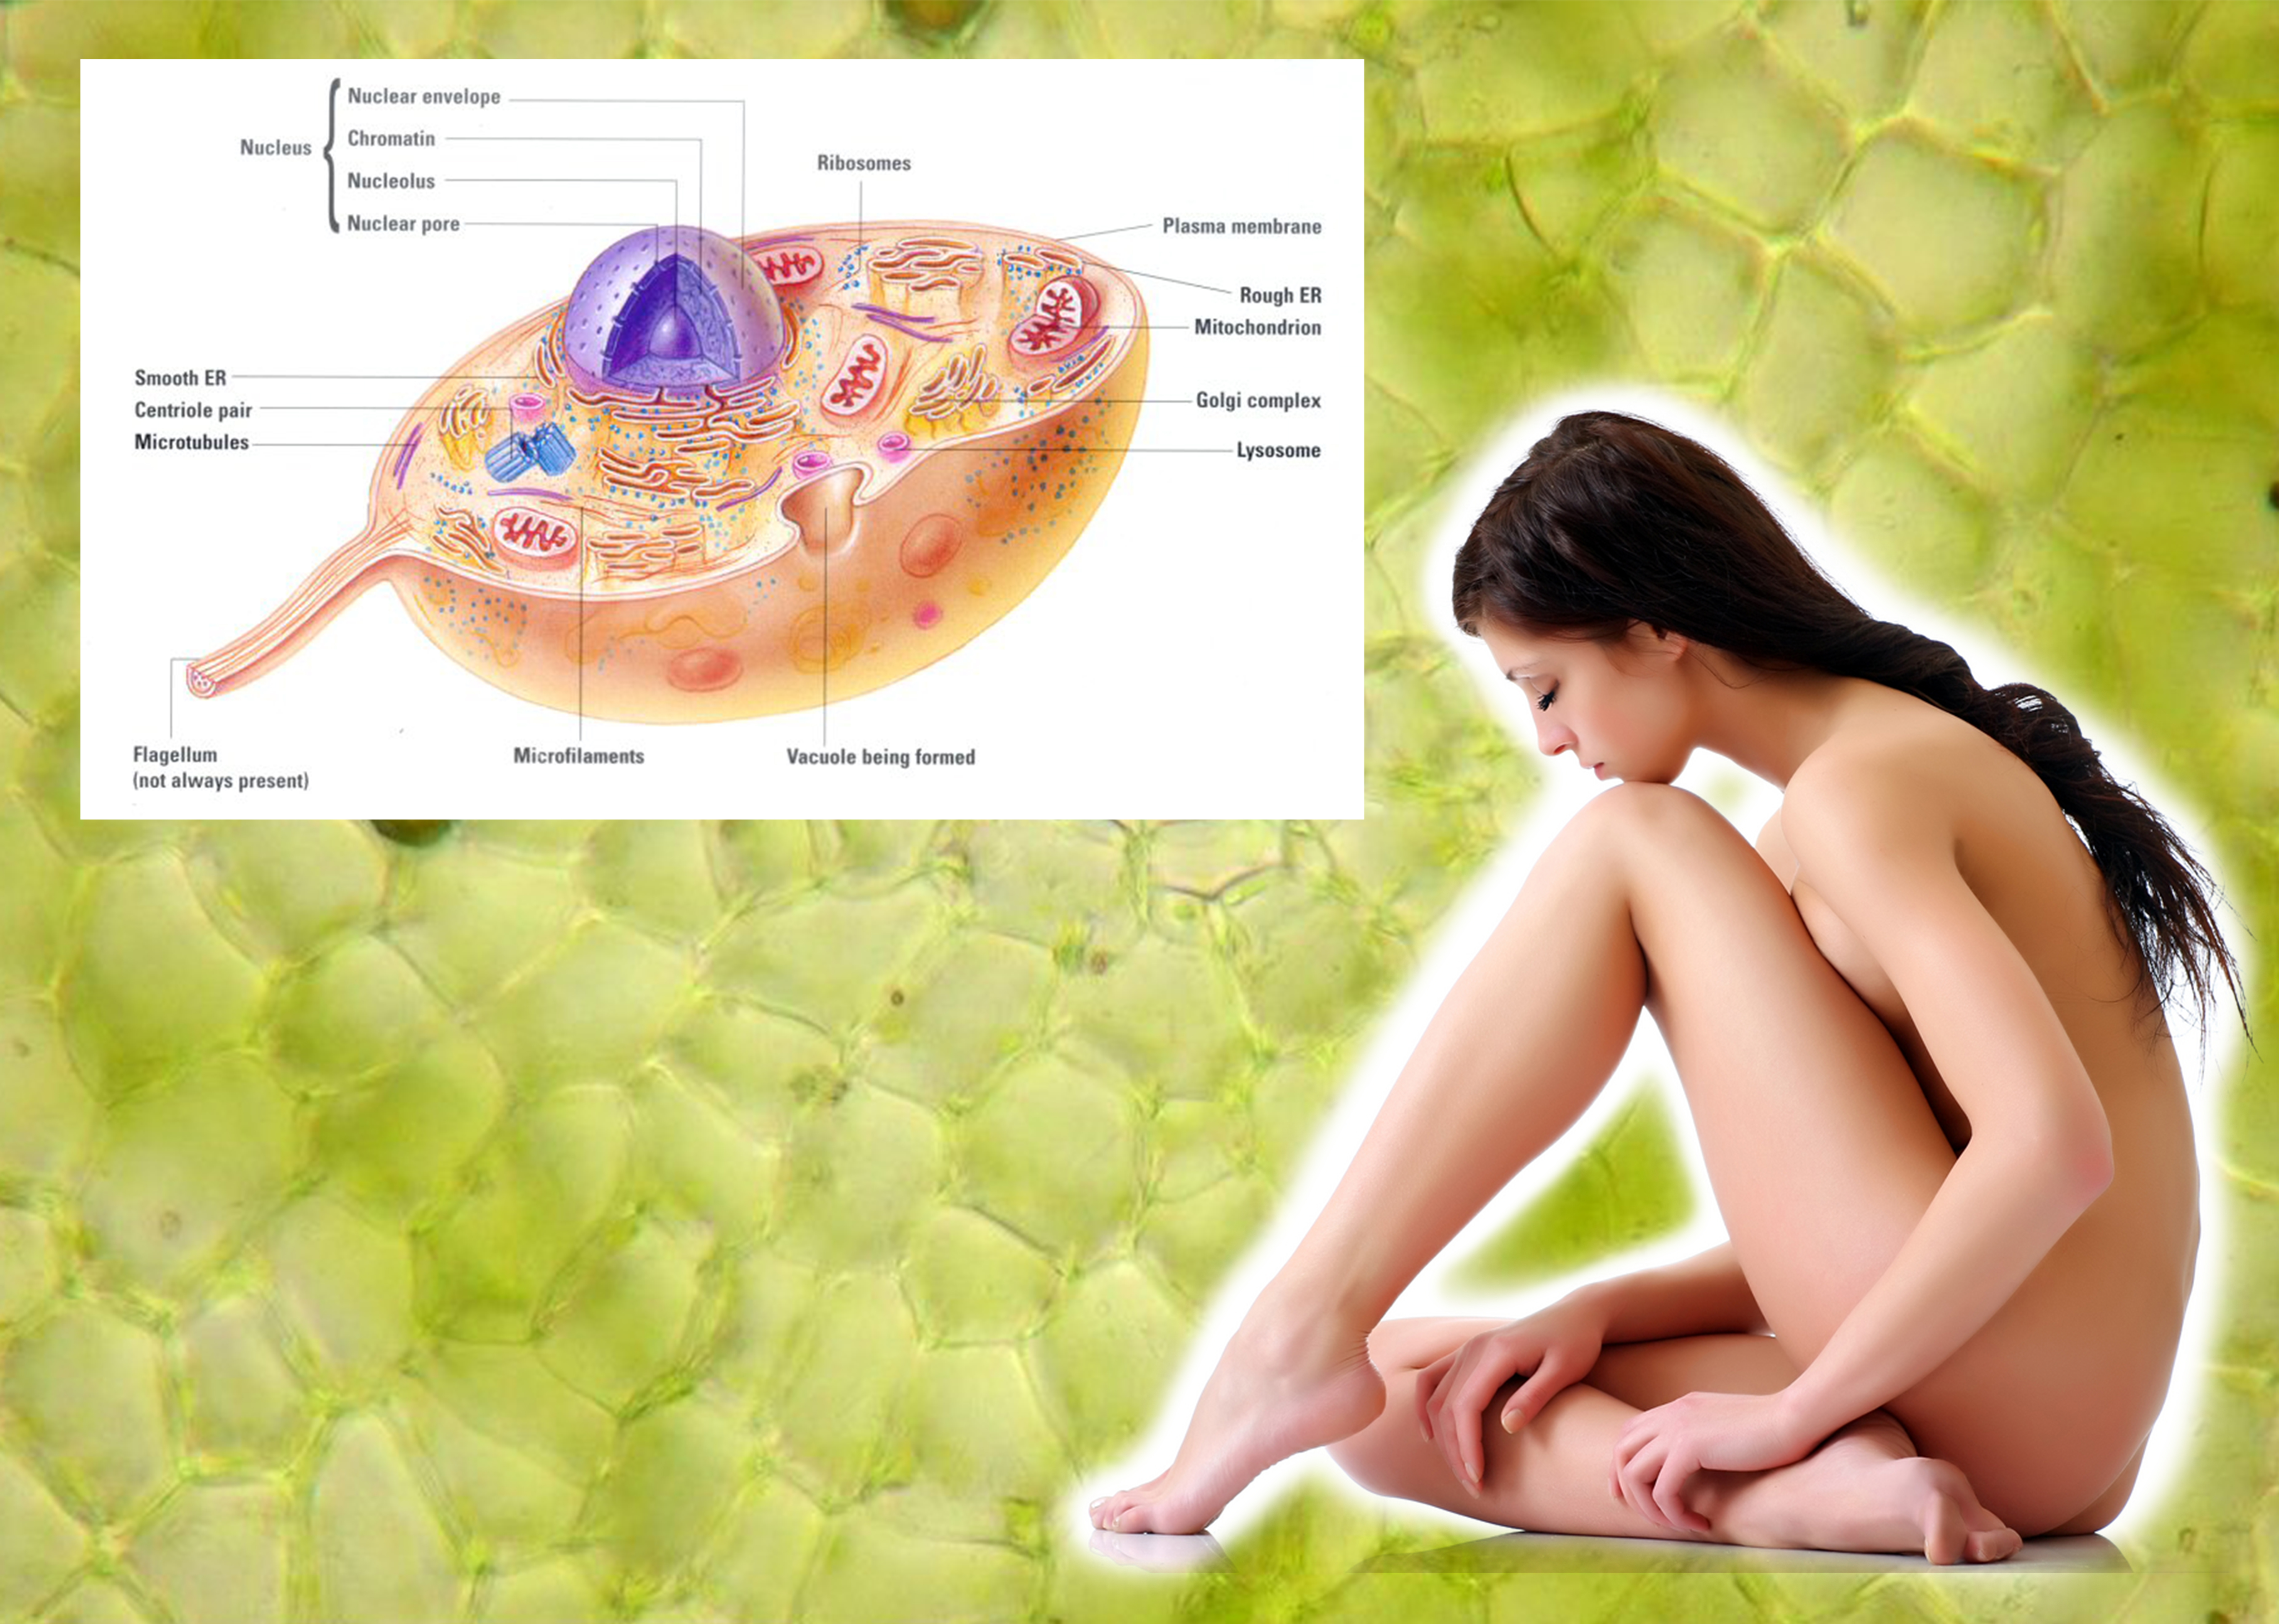 Human cells... a human body